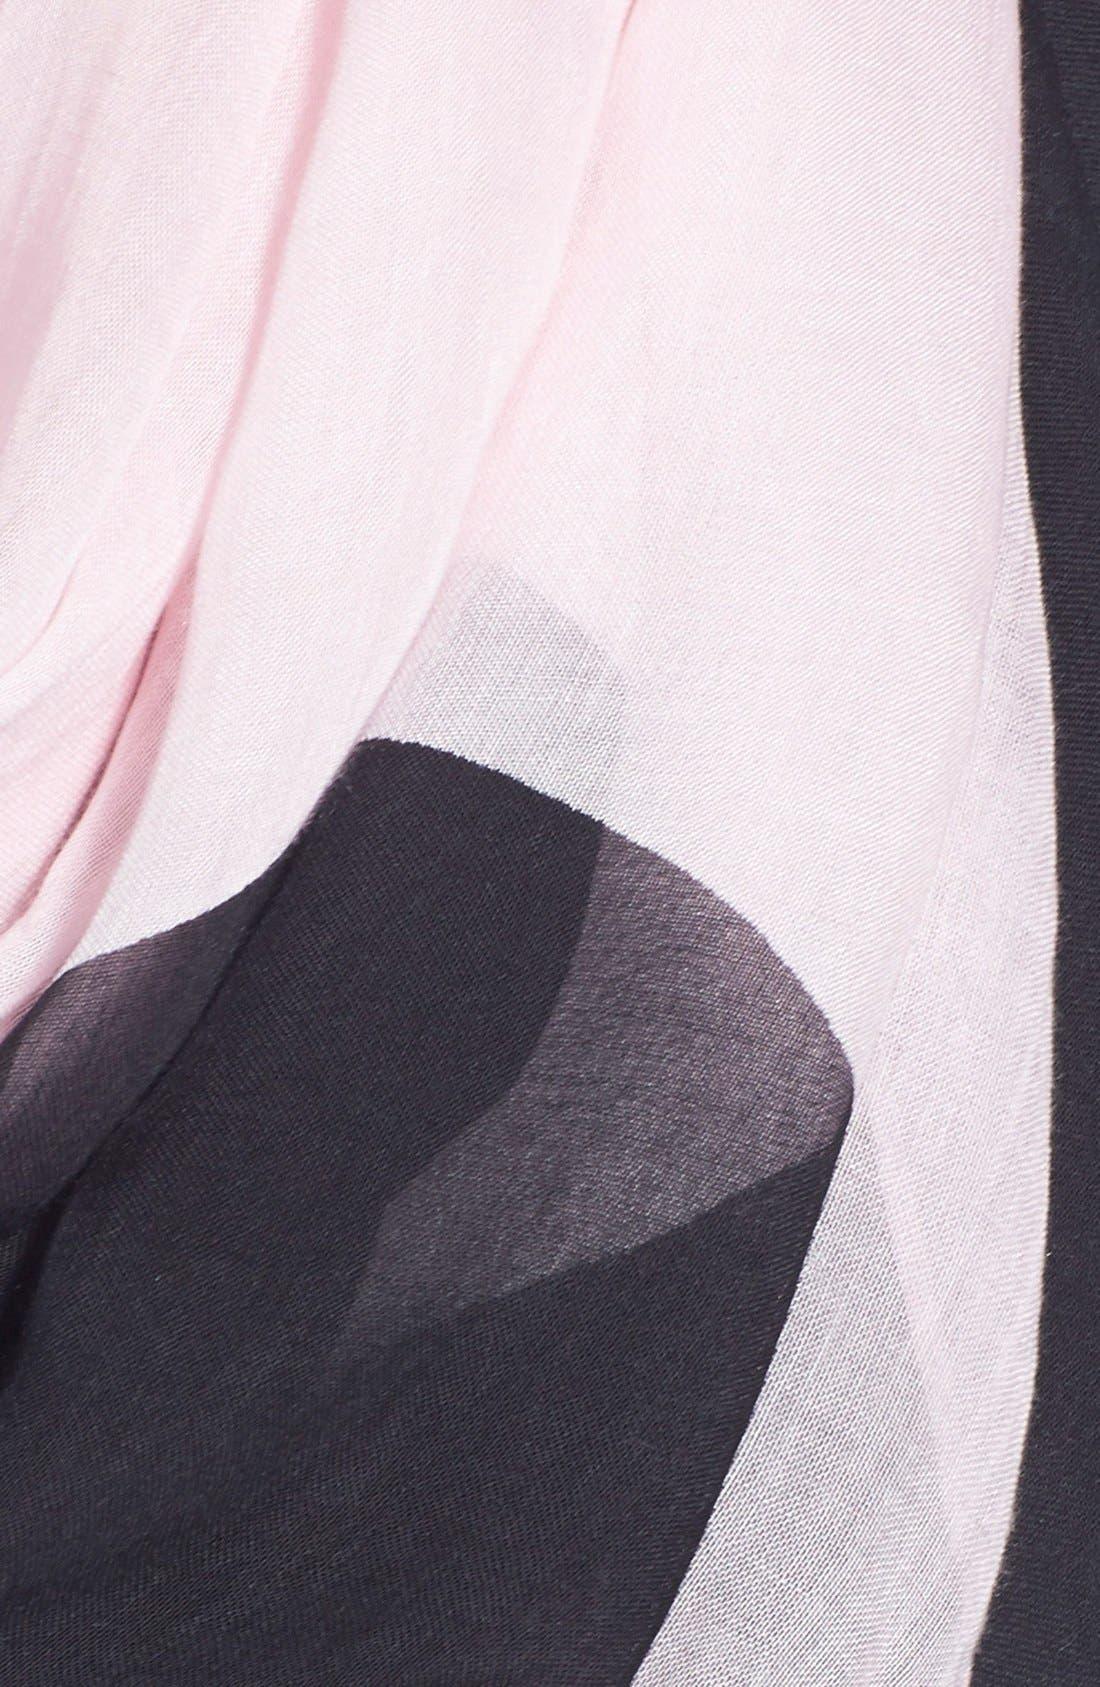 KATE SPADE NEW YORK, 'grand piano' scarf, Alternate thumbnail 2, color, 650